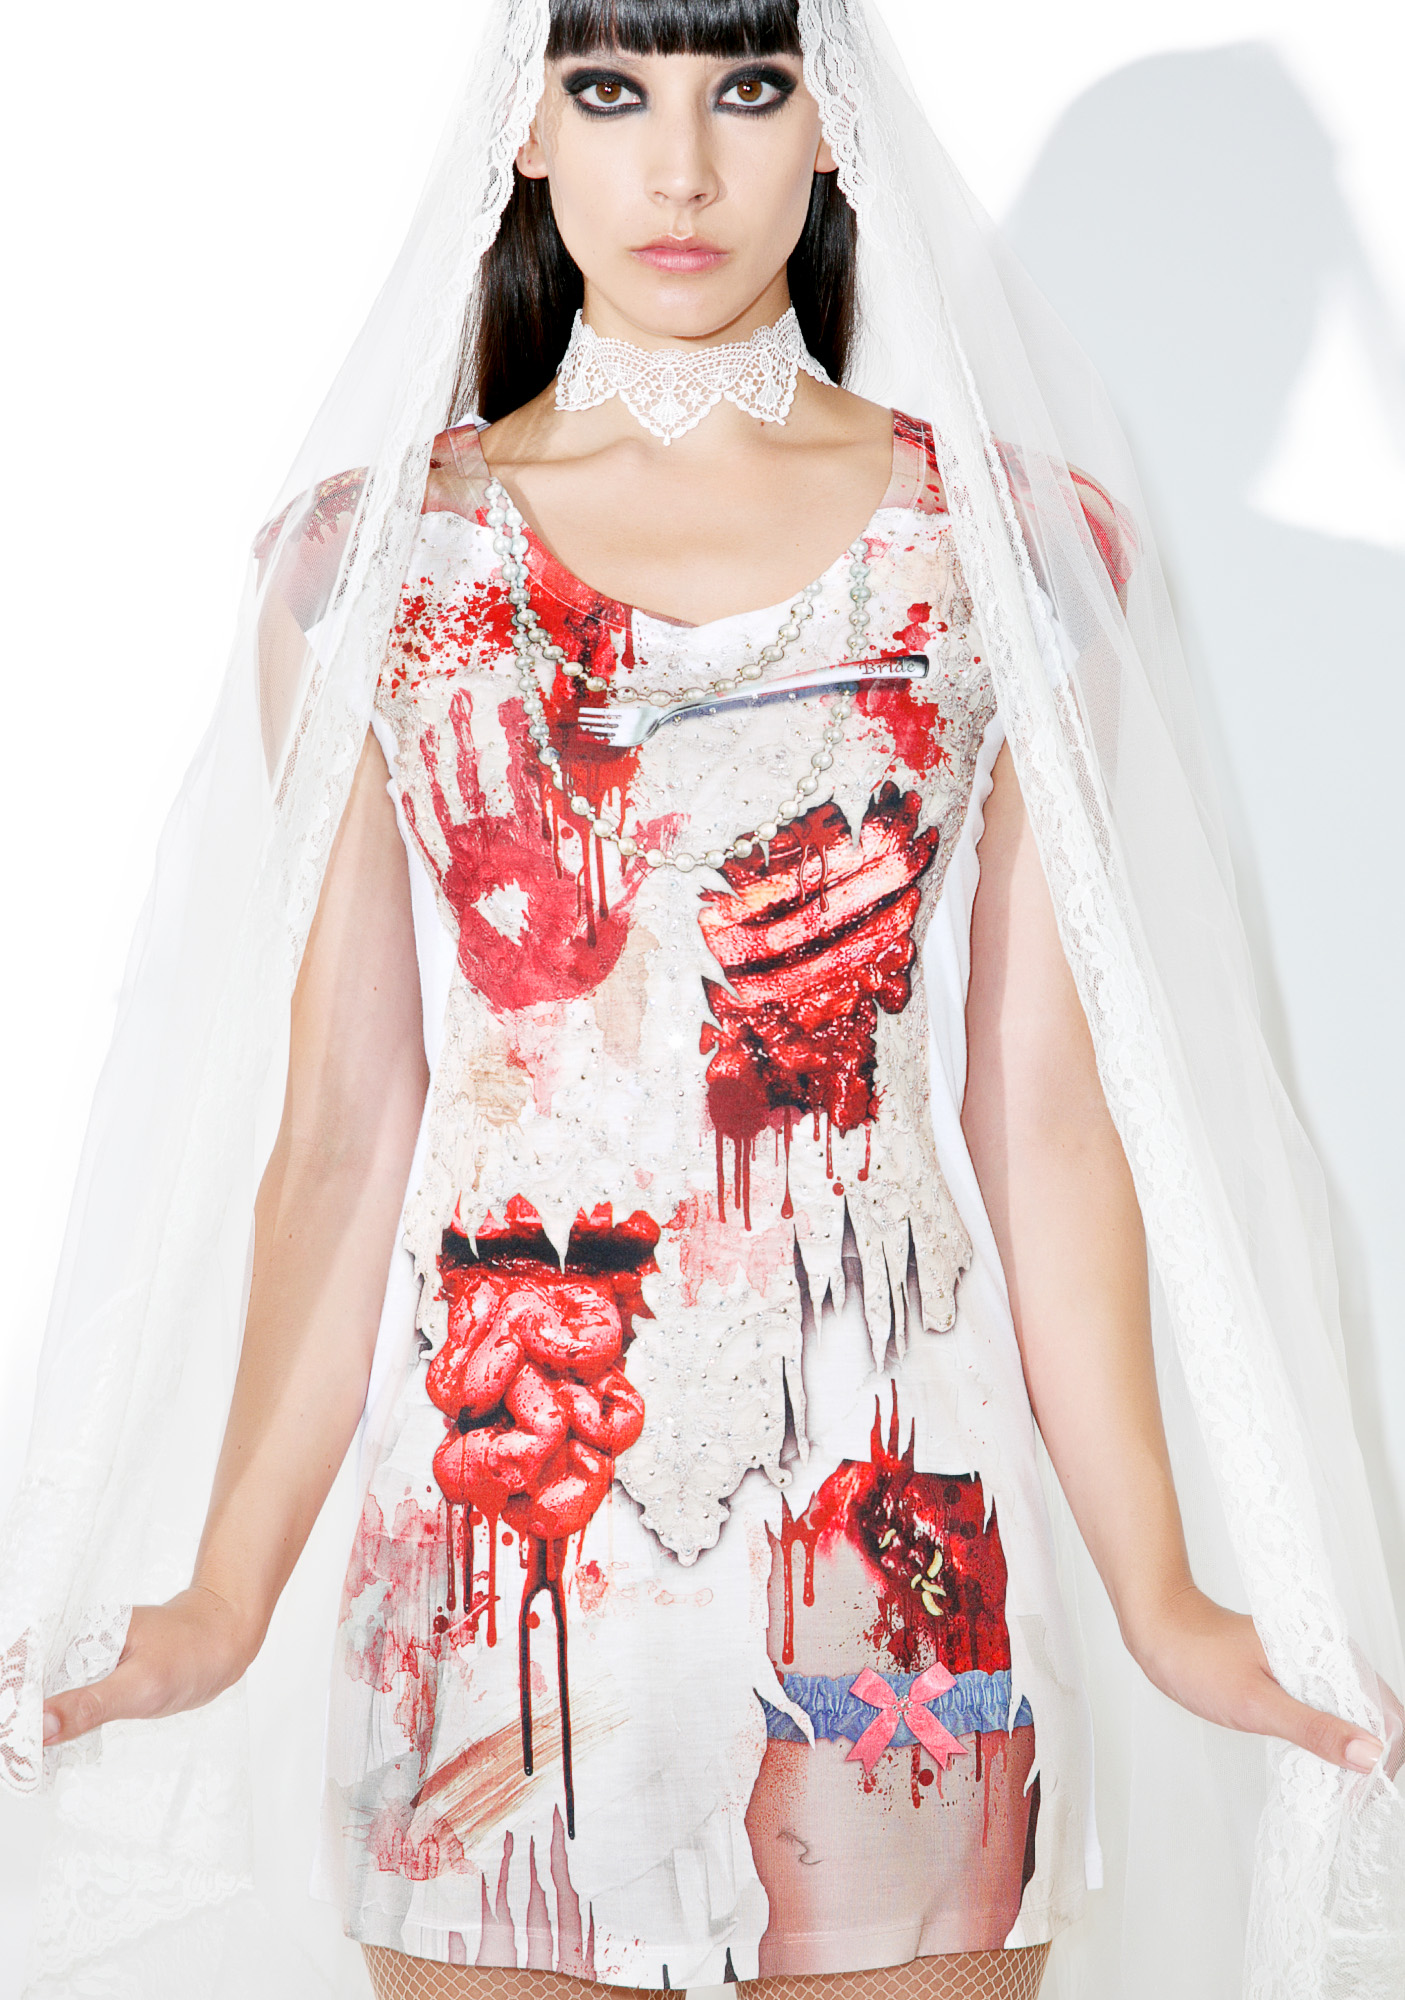 Ladies Zombie Bride Tshirt